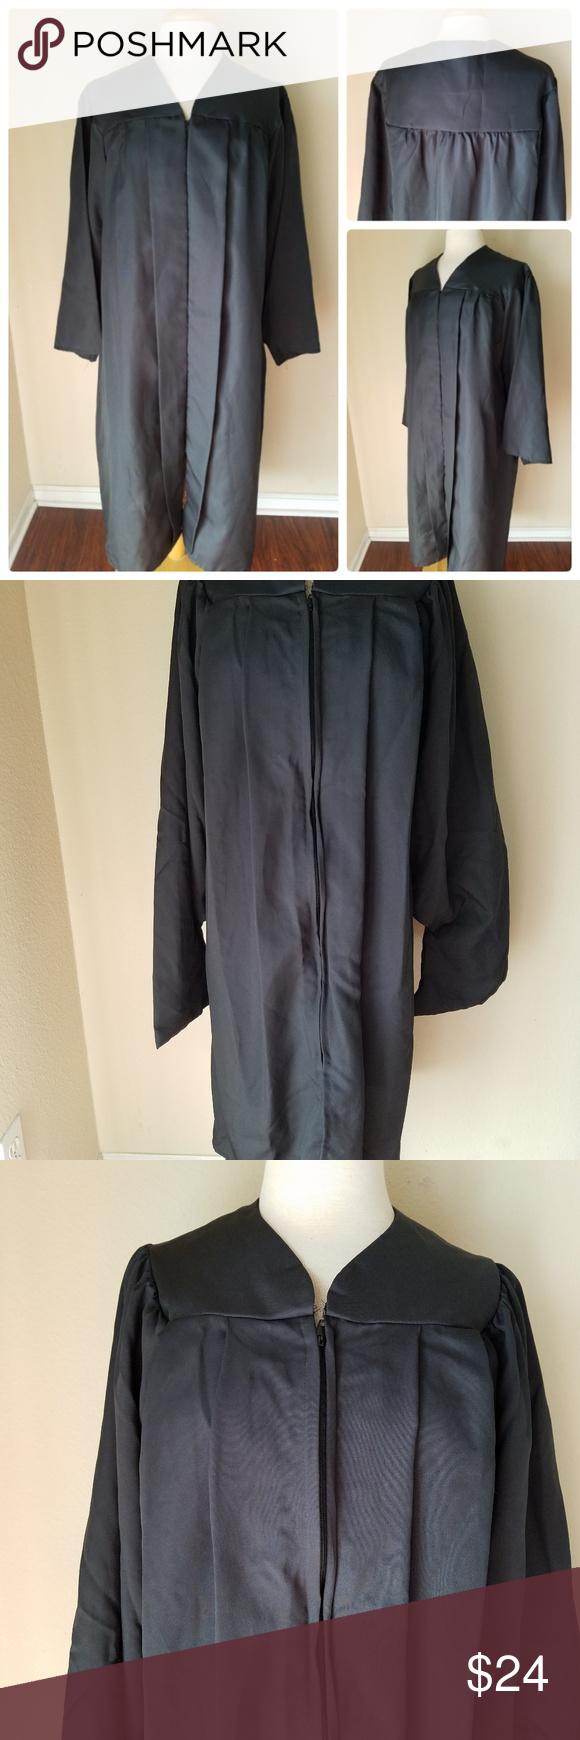 Oak Hall Graduation Gown Black Unisex 5 52 My Posh Closet